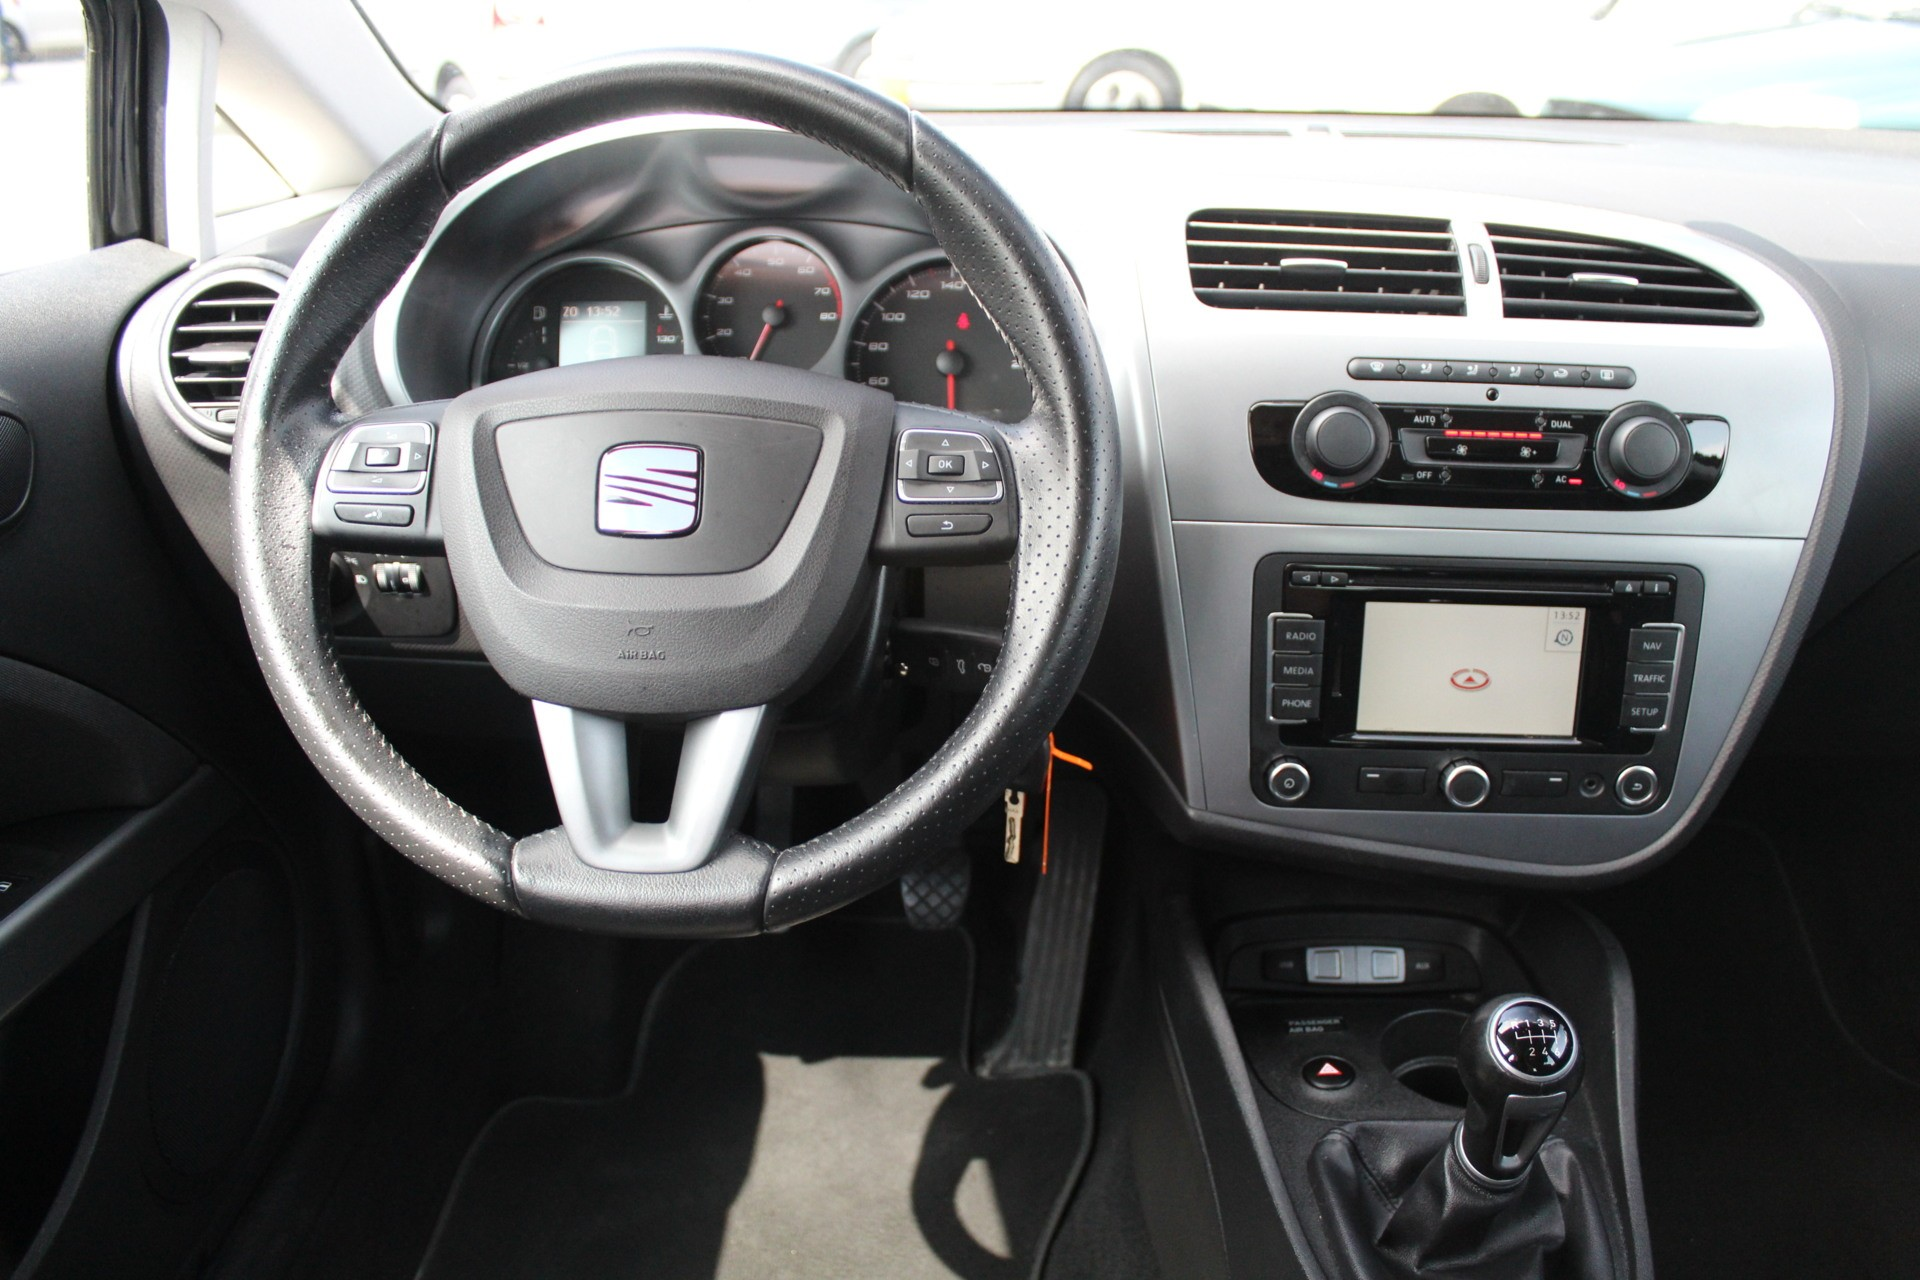 Caroutlet Groningen - Seat Leon 1.2 TSI Ecomotive Businessline COPA | NAVI| CLIMA | CRUISE